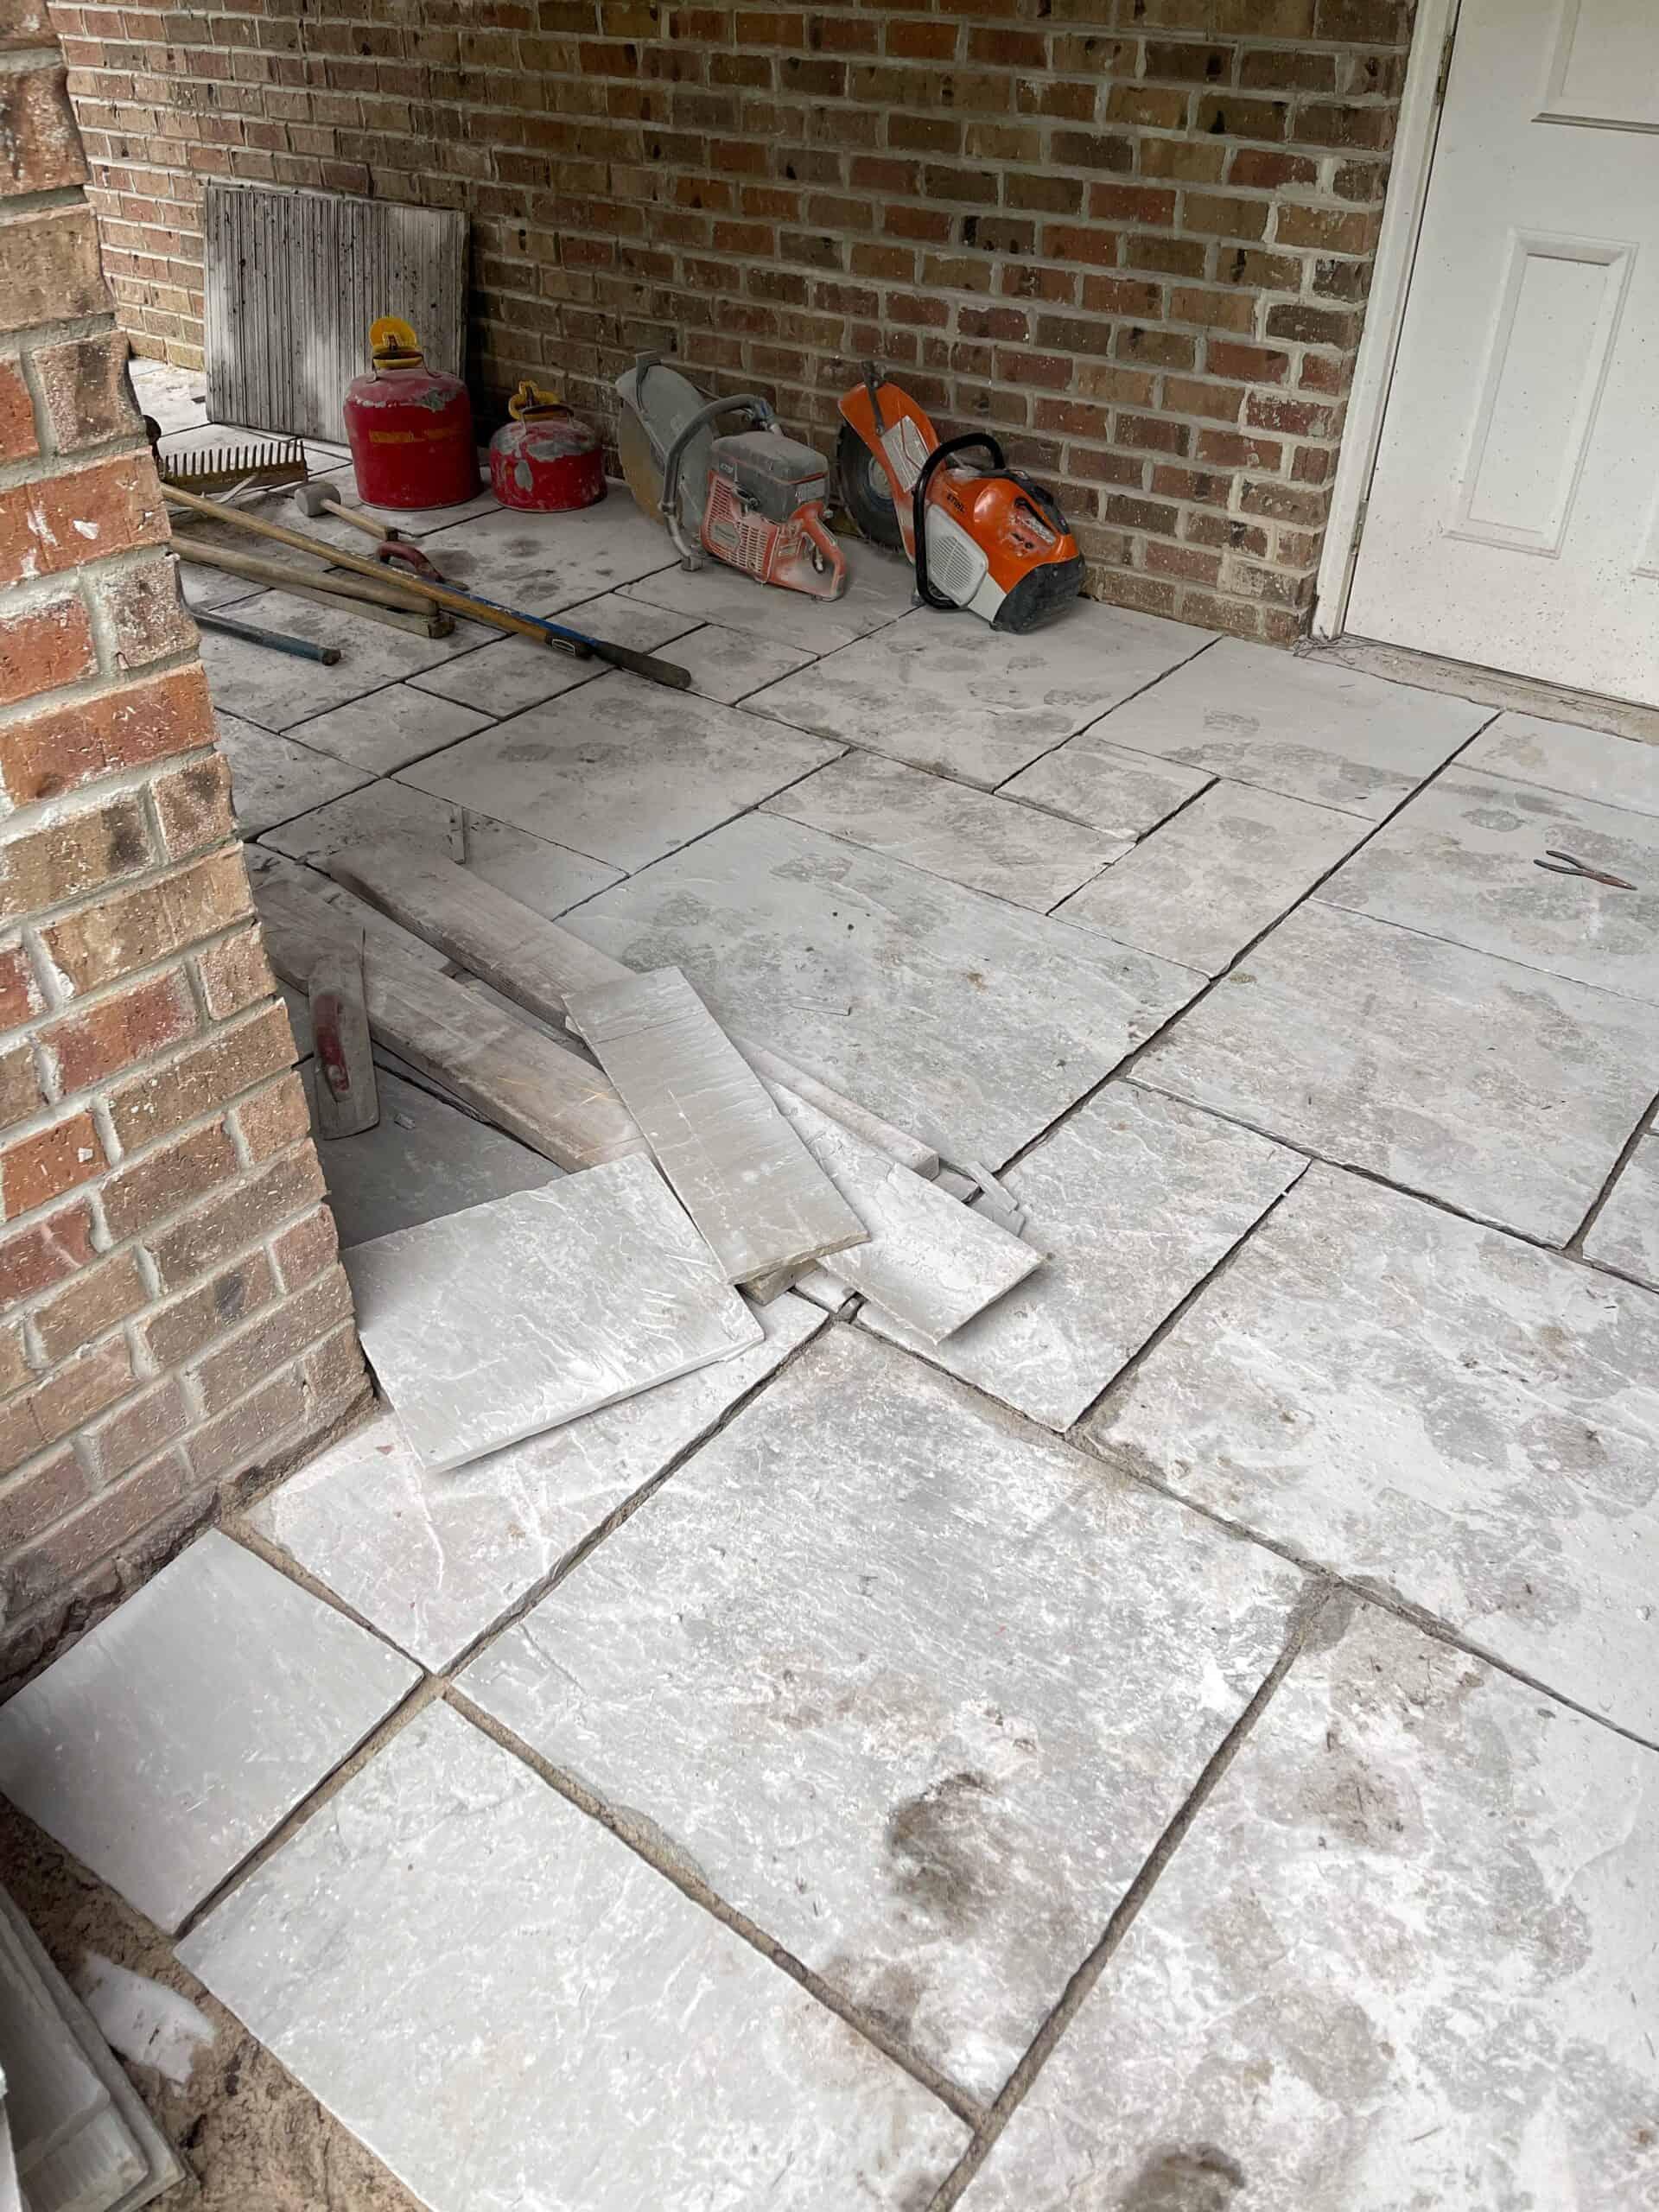 Flagstone cut in pieces around brick pillars.